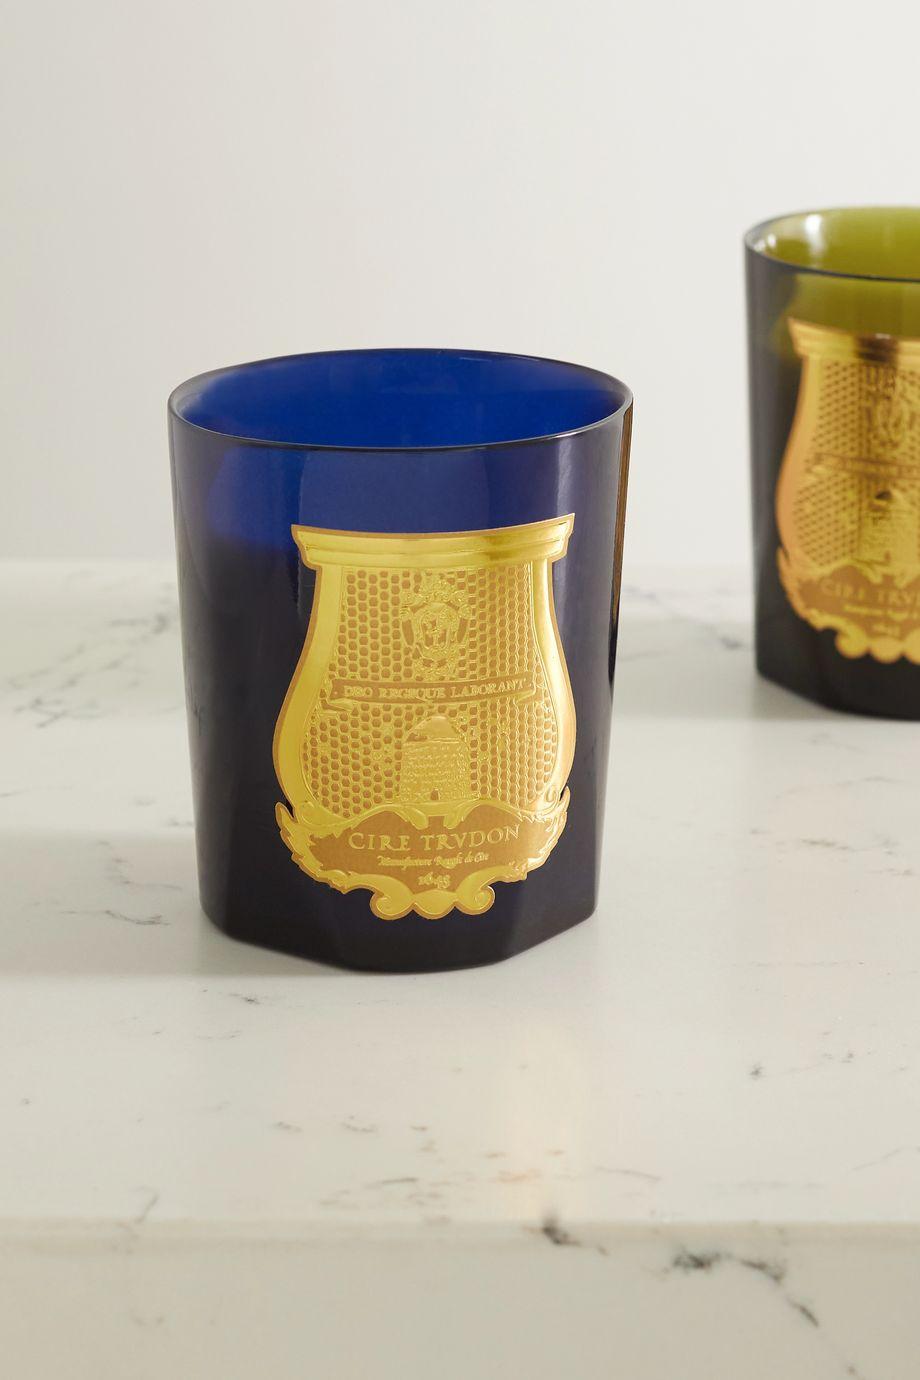 Cire Trudon Estérel scented candle, 270g